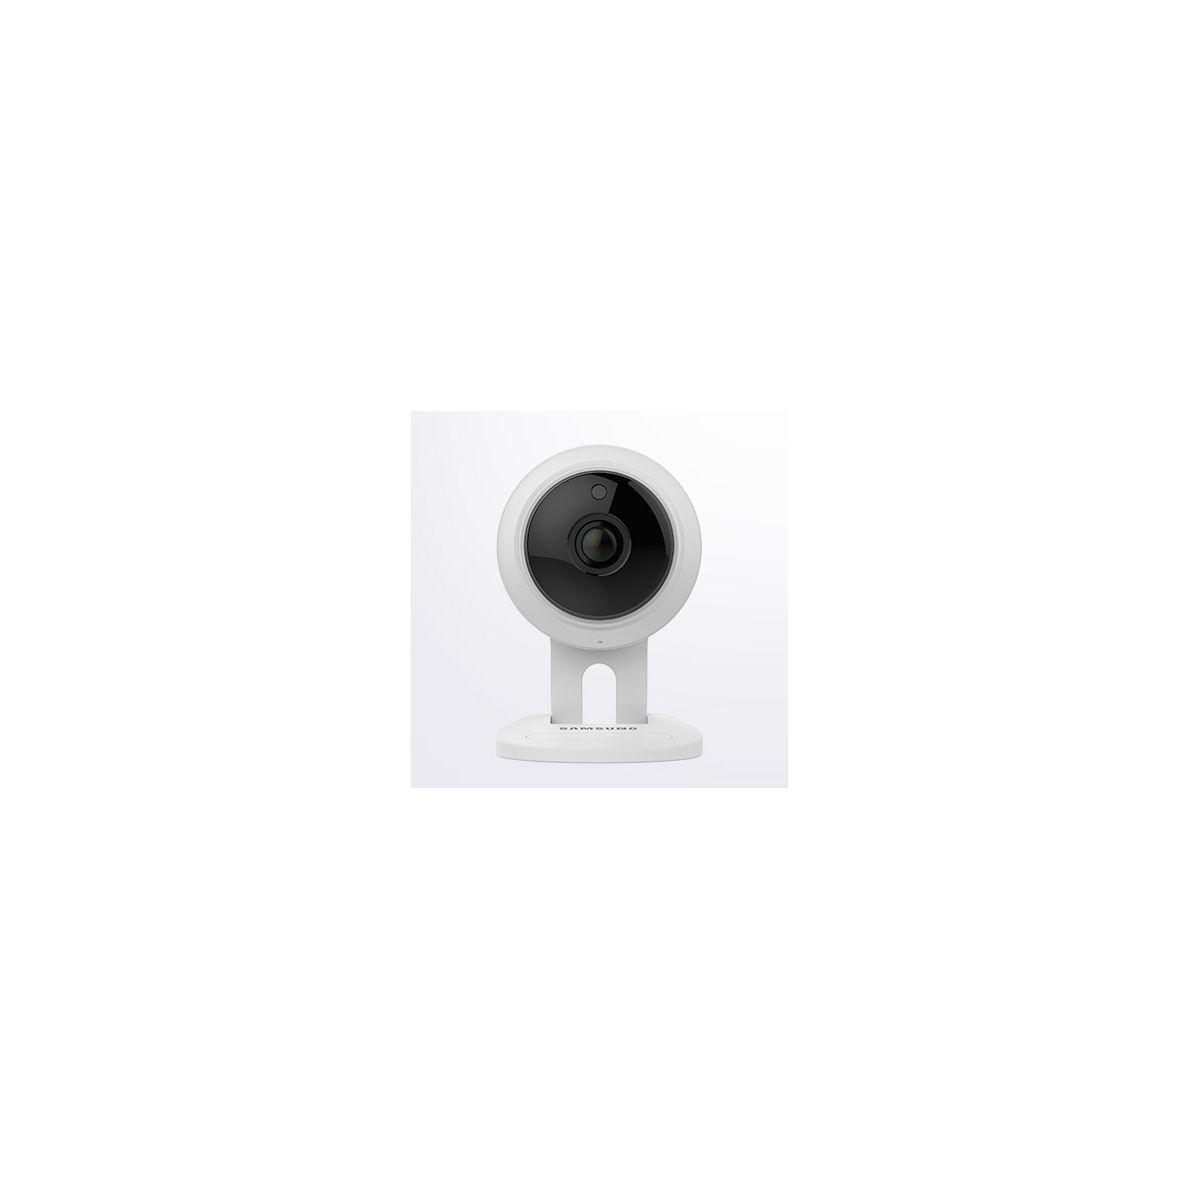 Caméra samsung smartcam intérieure full - livraison offerte : code chronoff